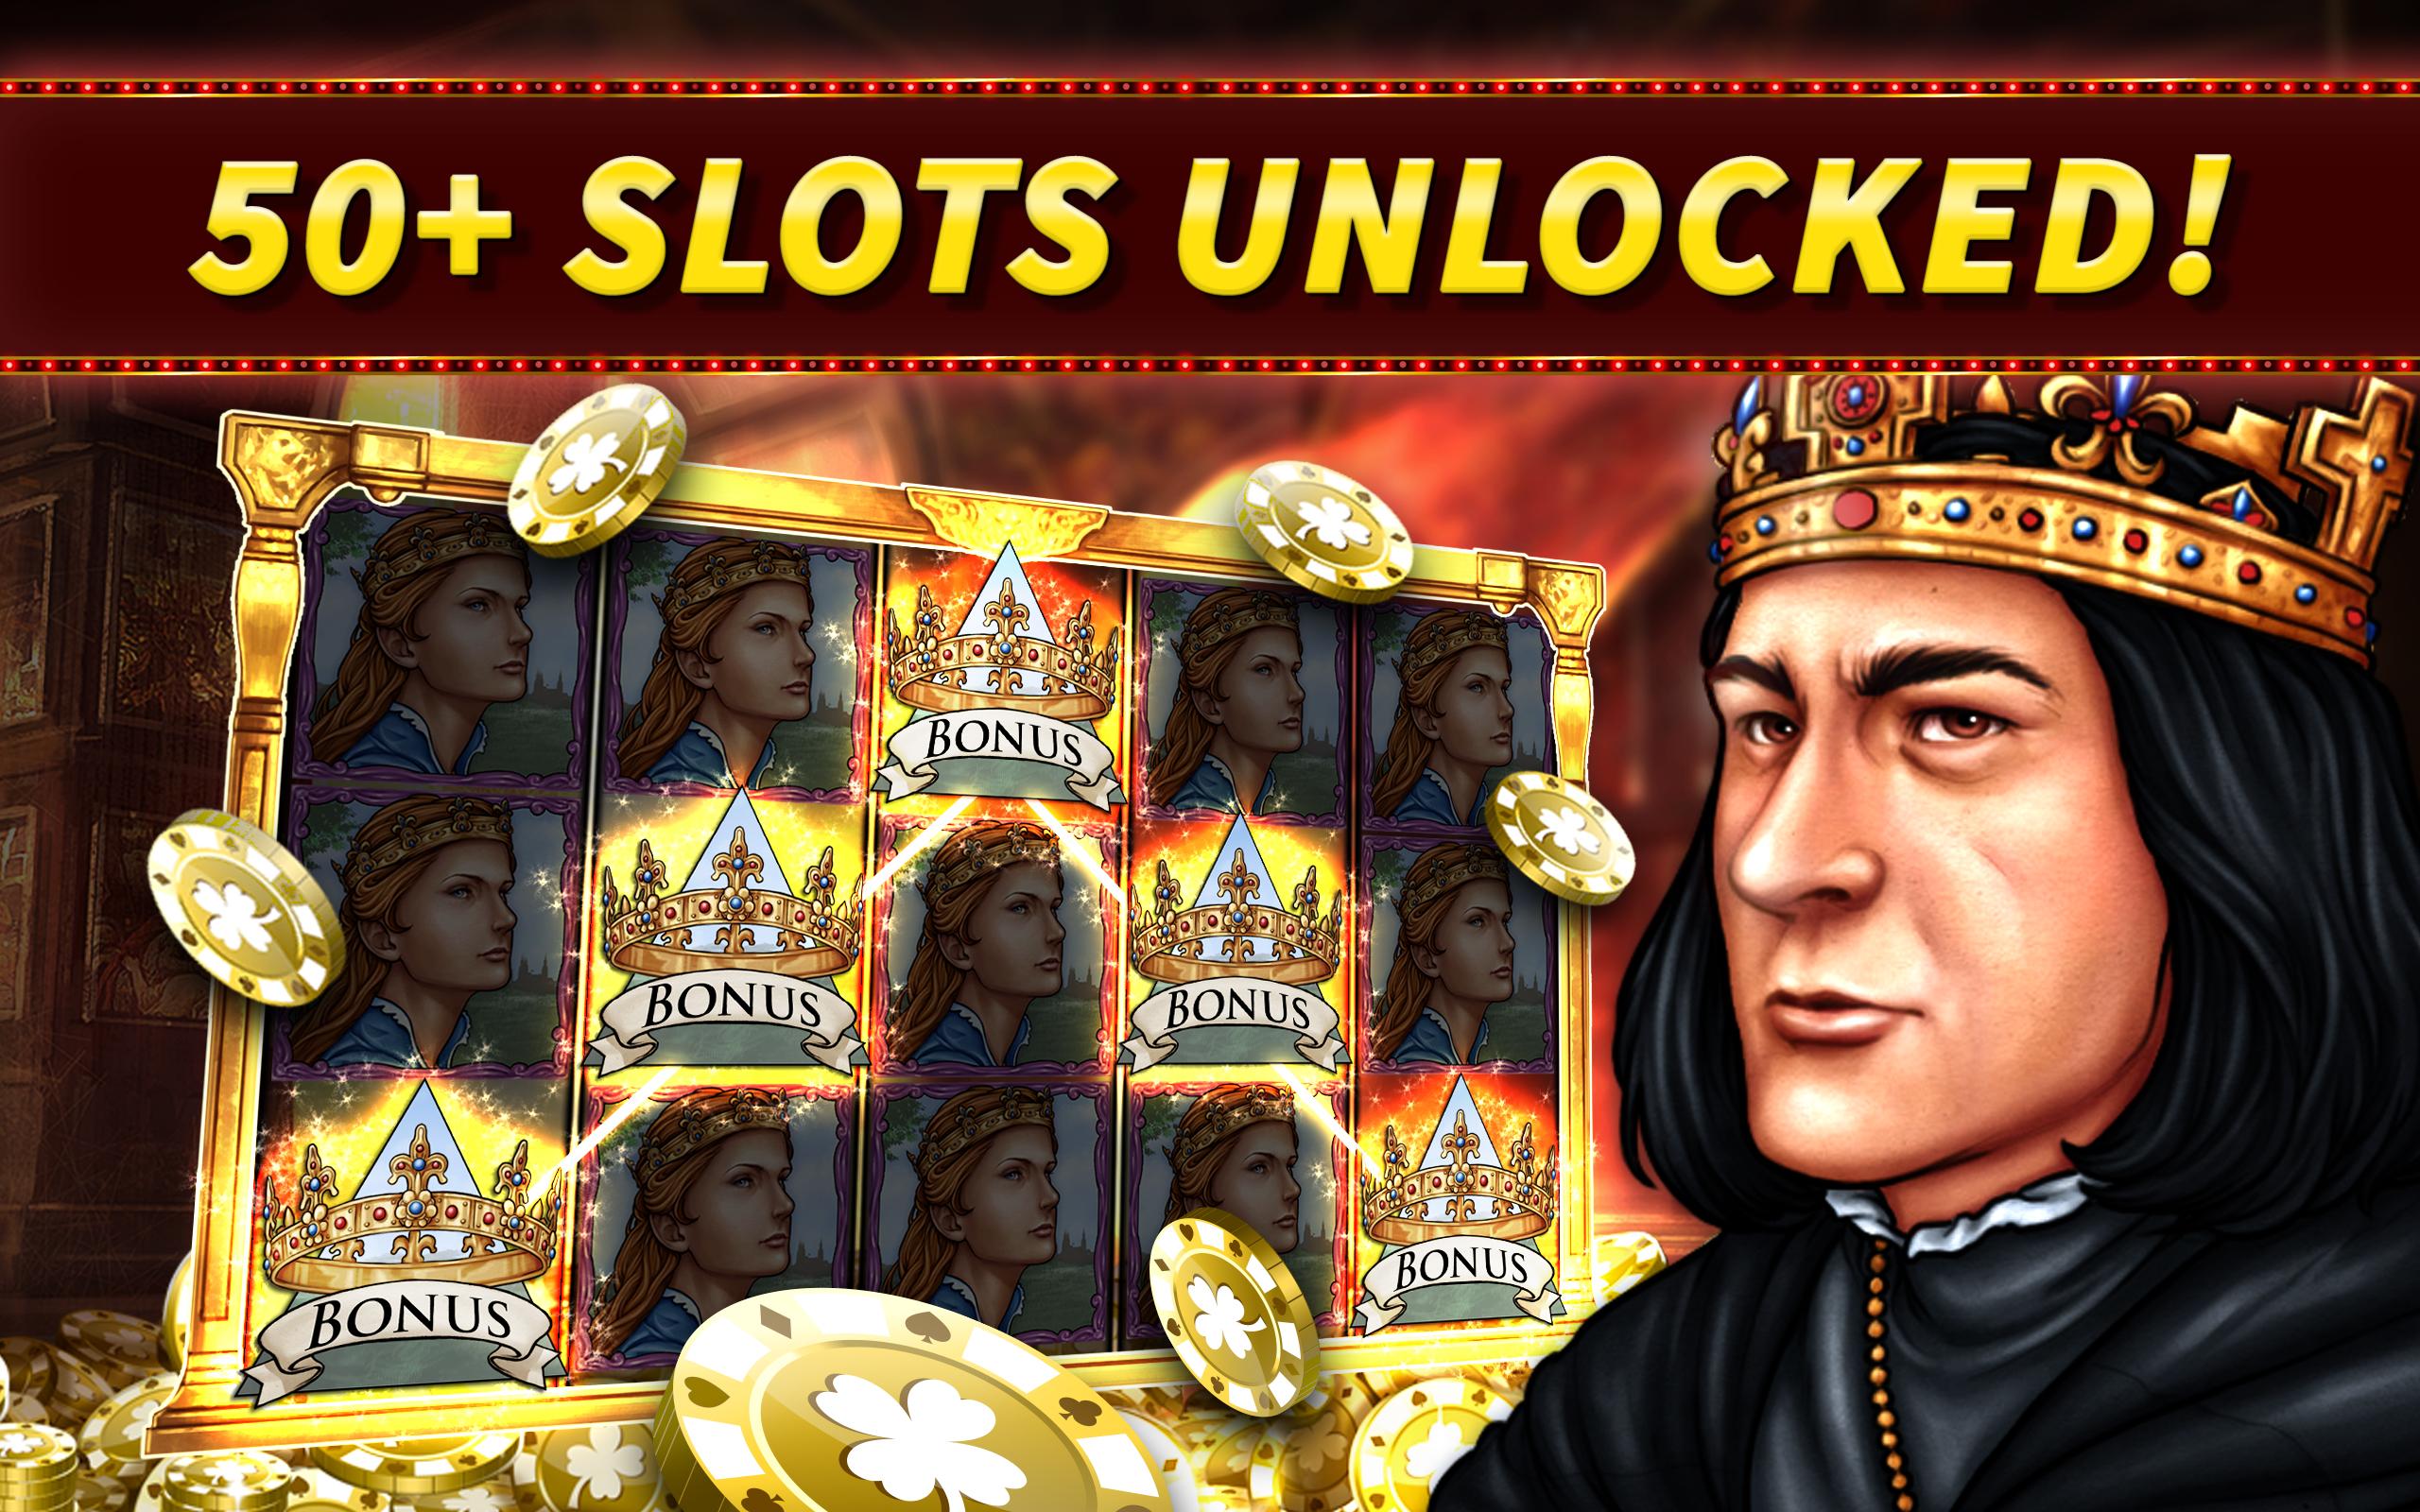 Double Up Casino Slot Machines